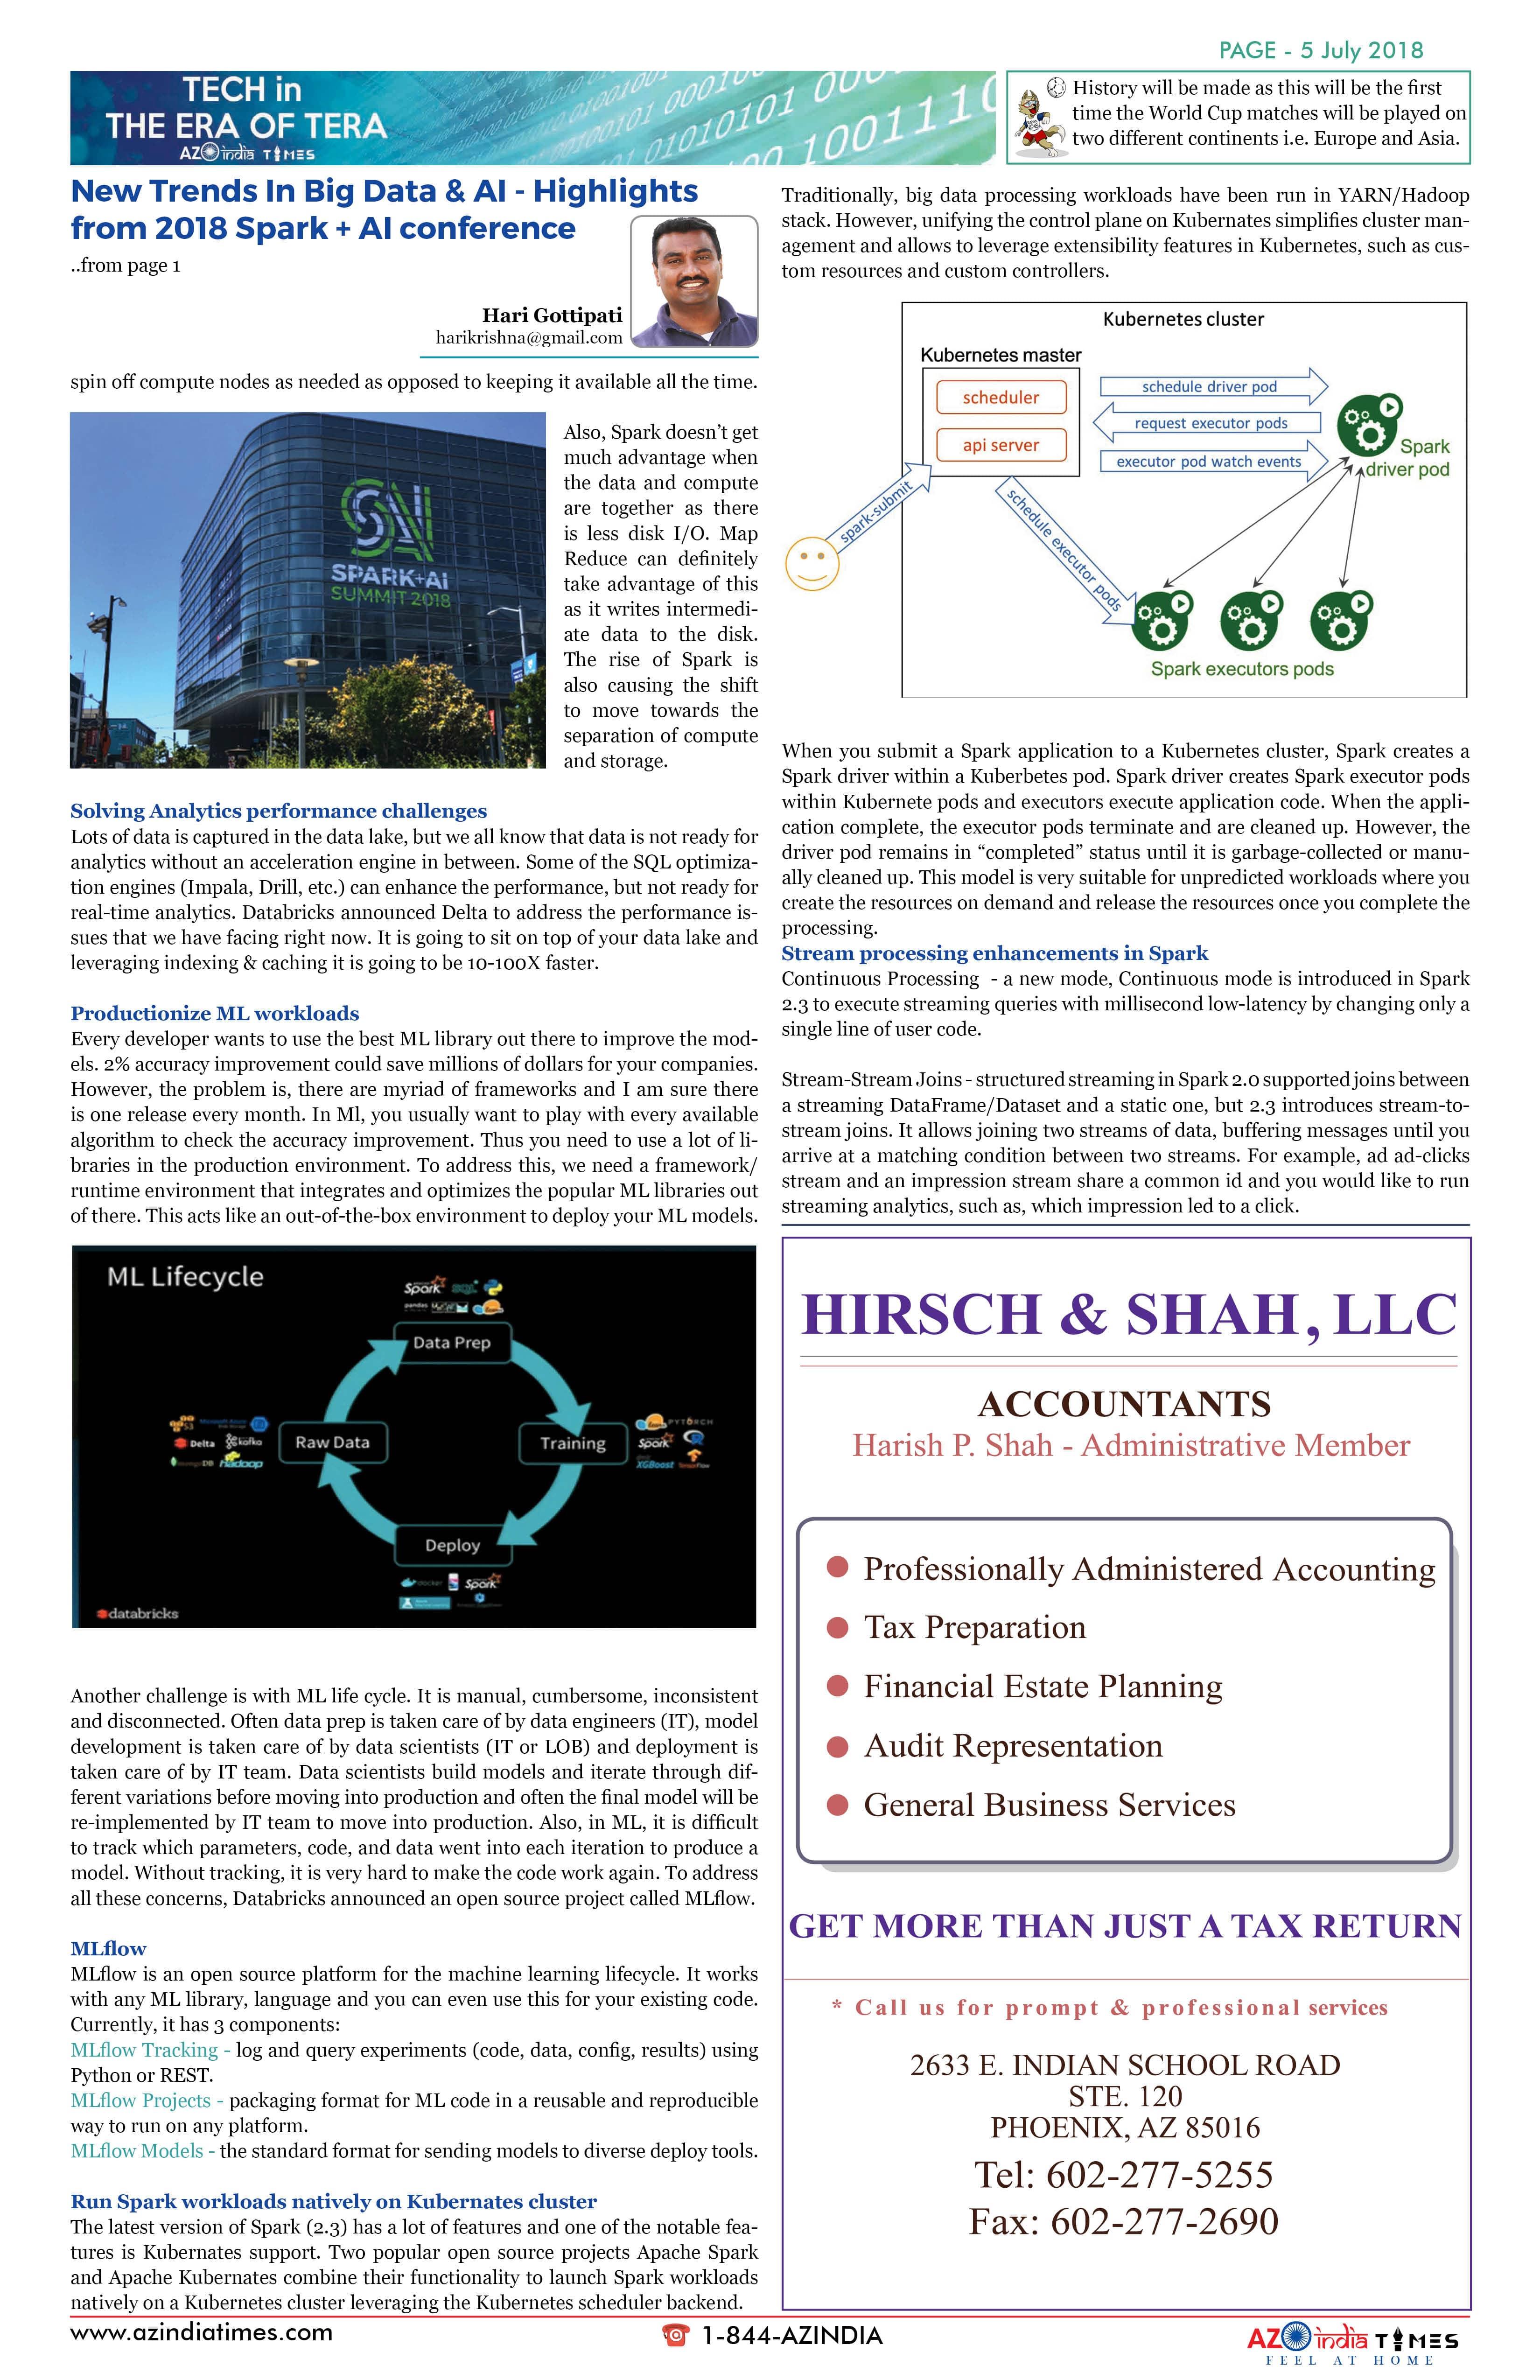 AZ INDIA JULY EDITION5